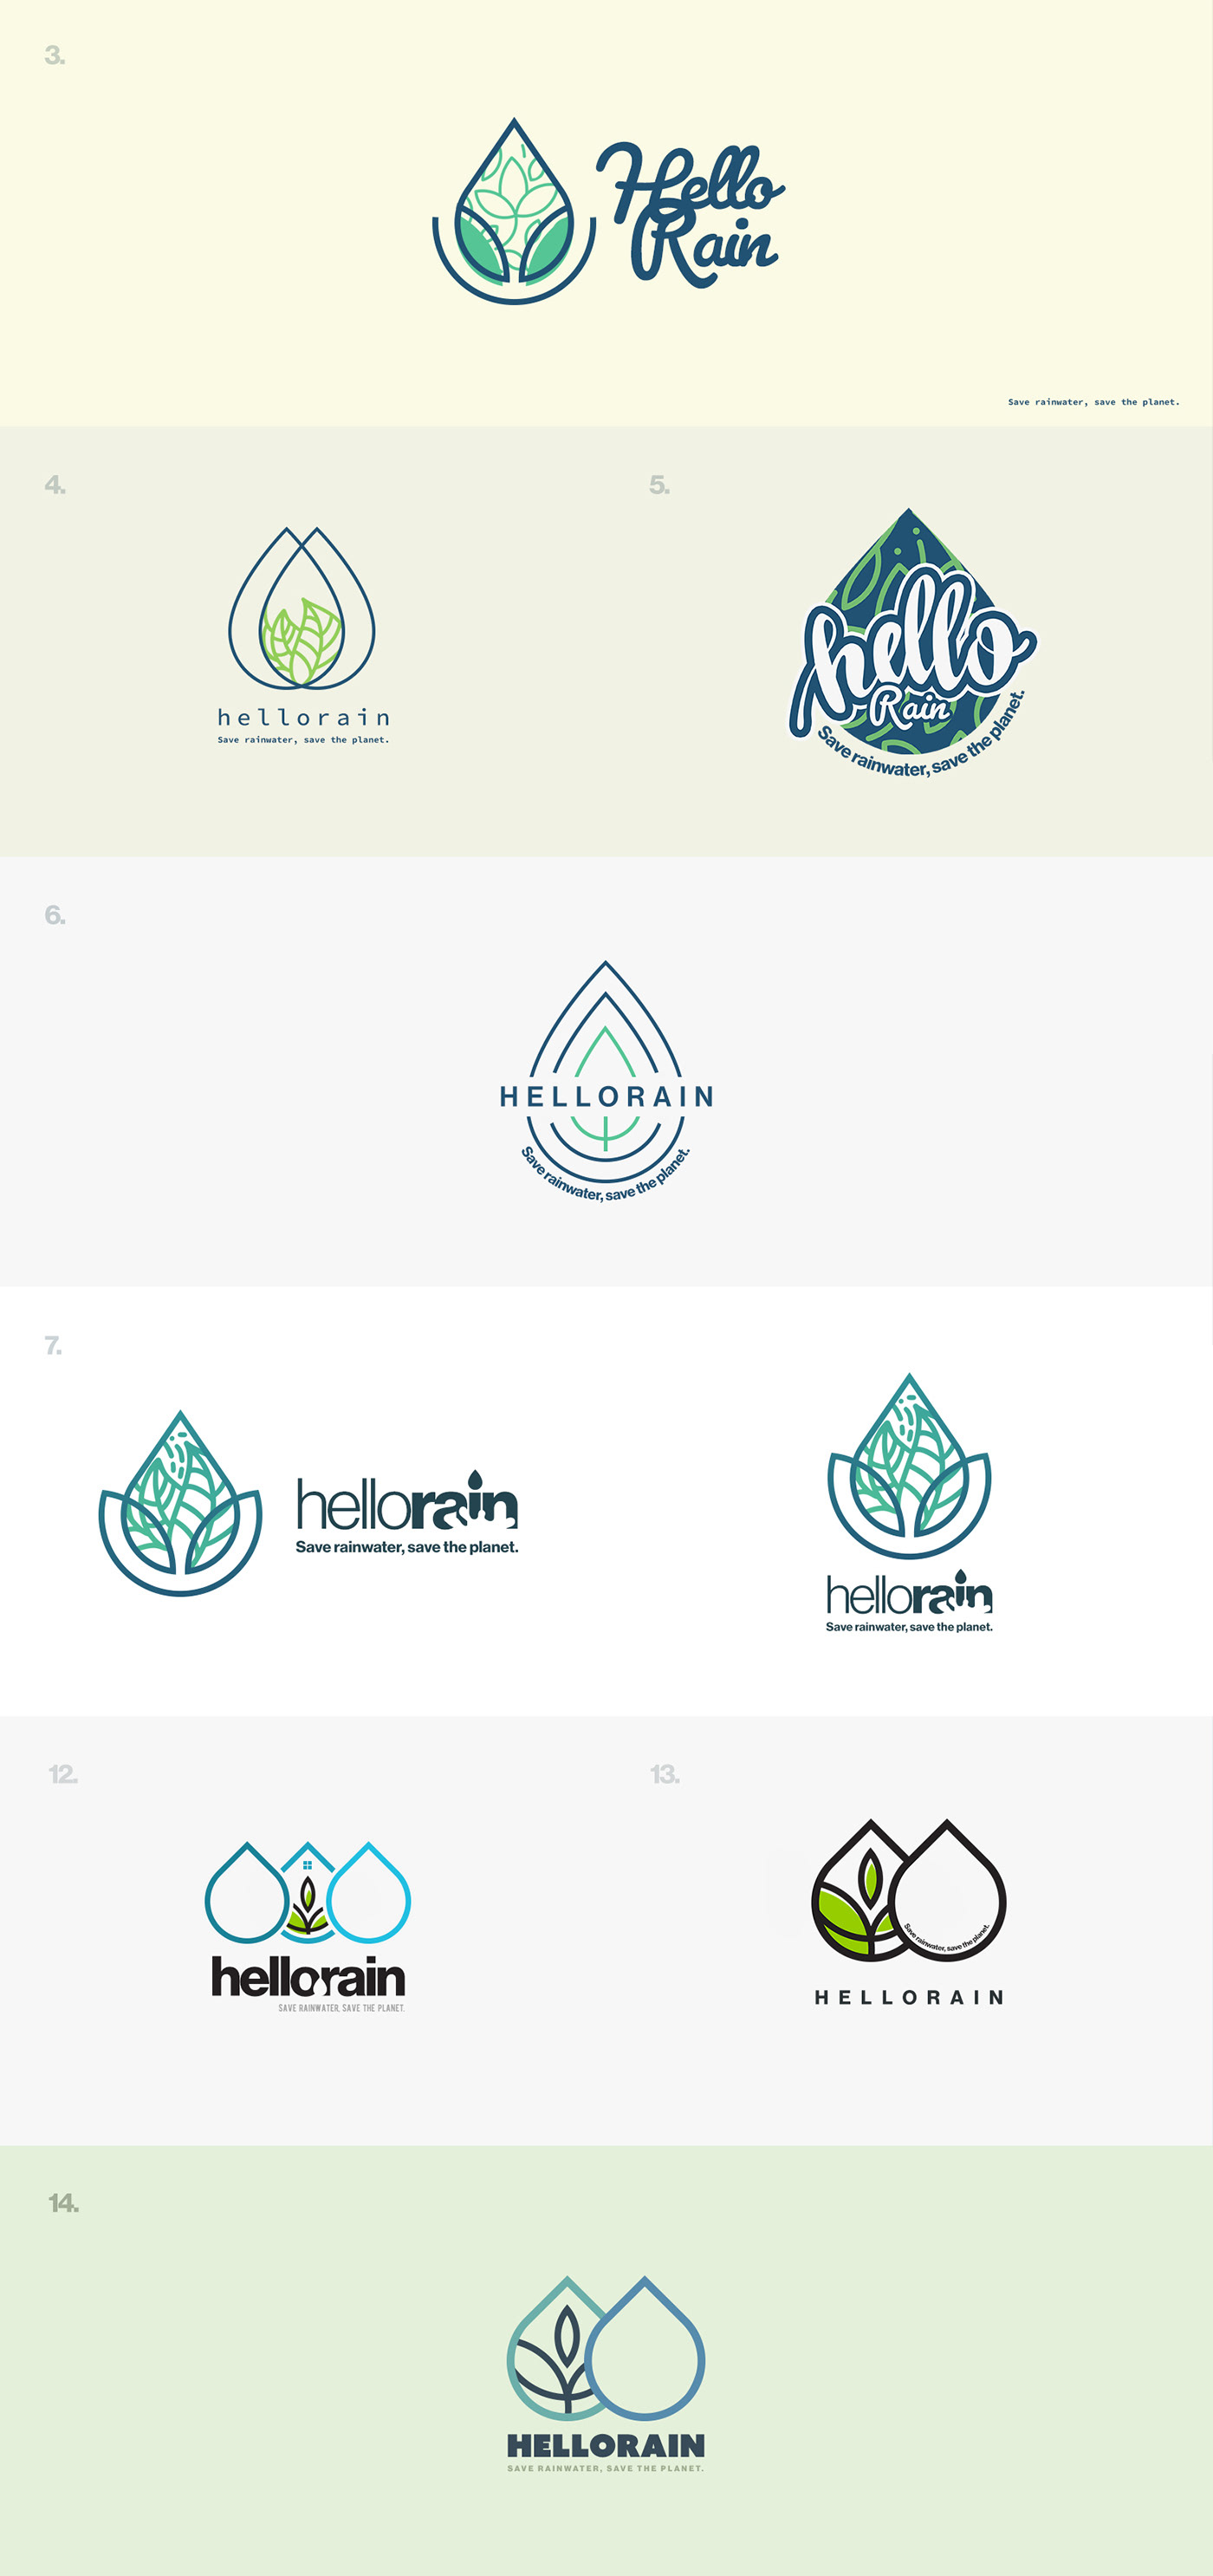 design hello logo Logo Design rain water Web Design